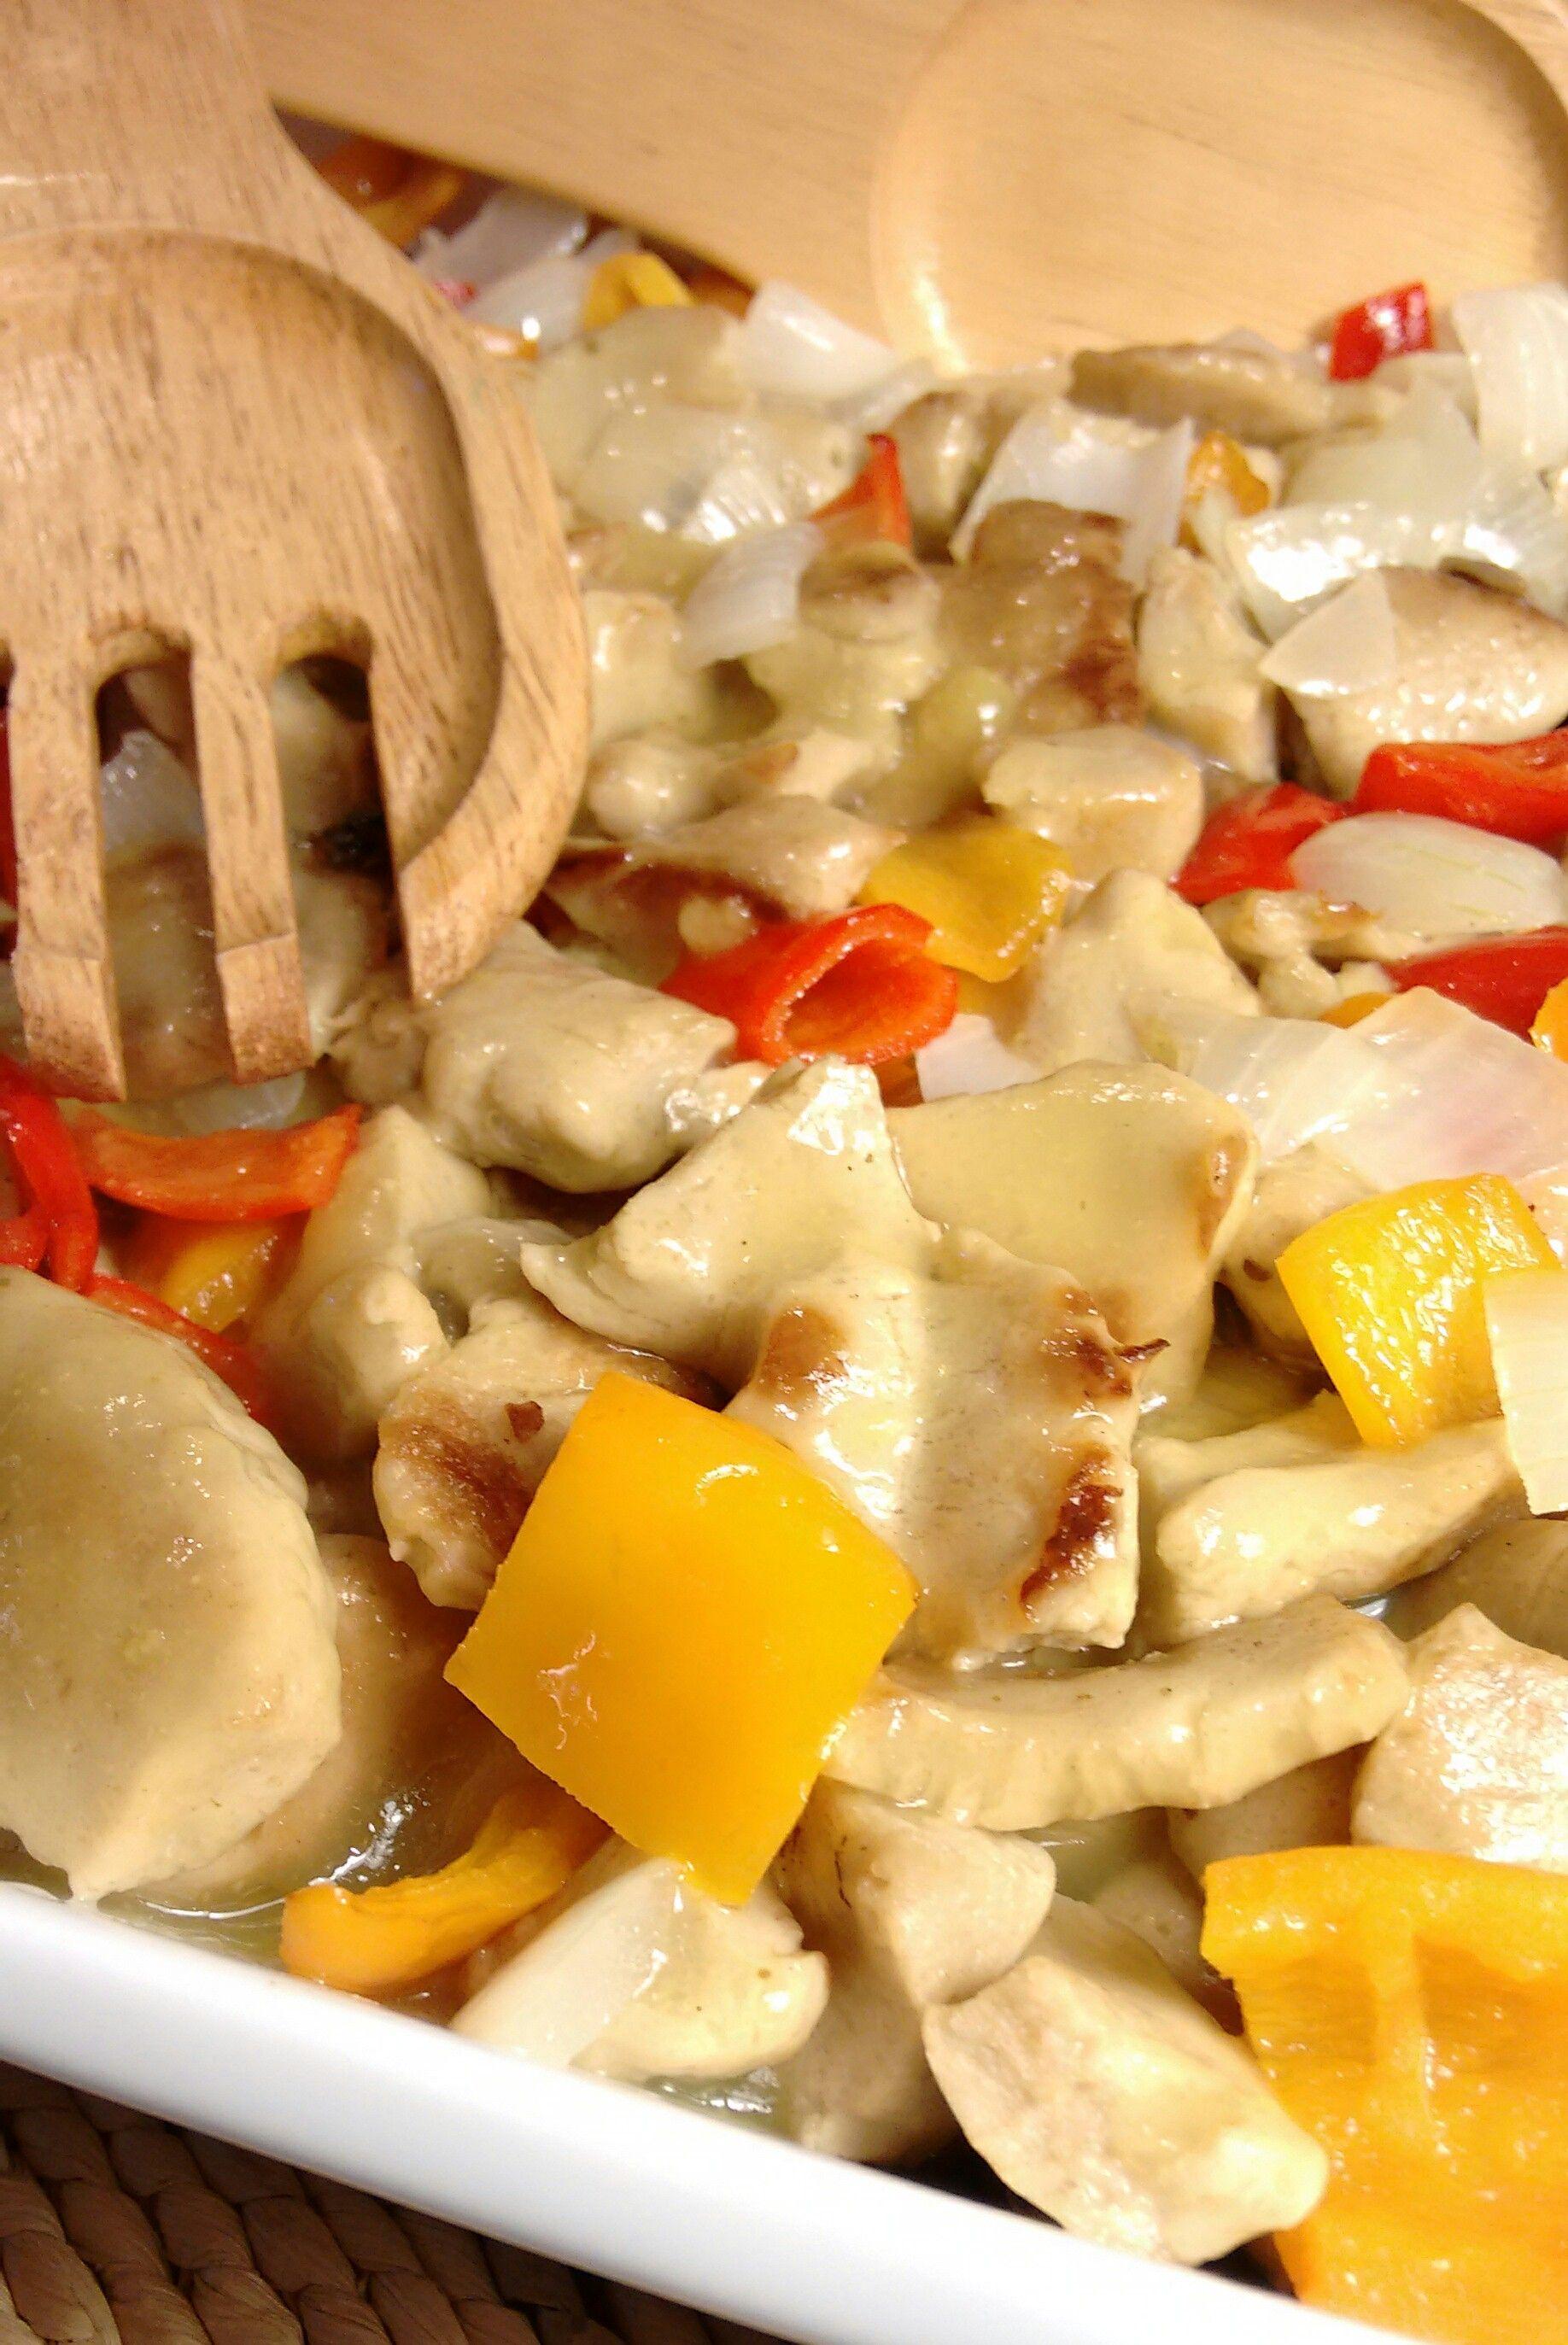 Paula eakins vegetable skallops and gravy healthy vegetarian food forumfinder Image collections